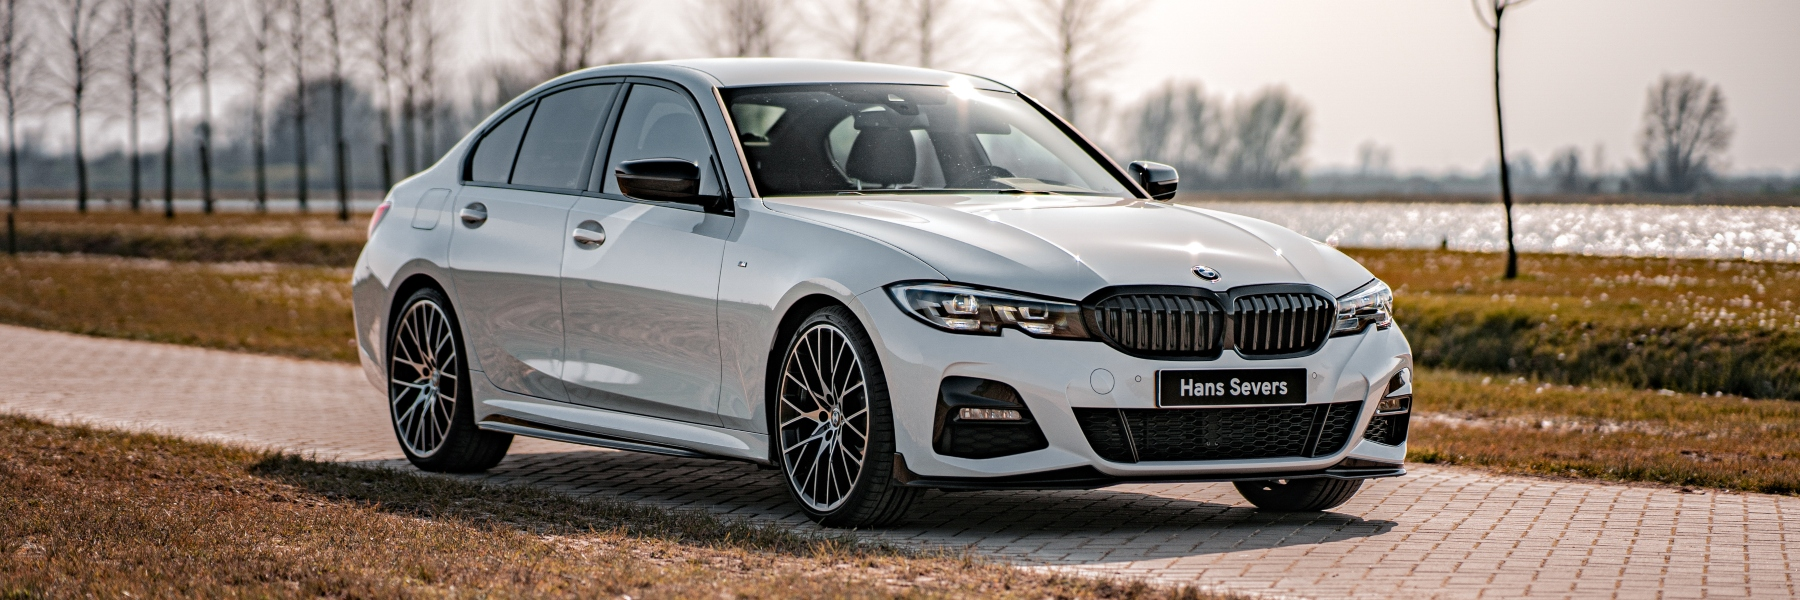 De nieuwe BMW 3 Serie Sedan